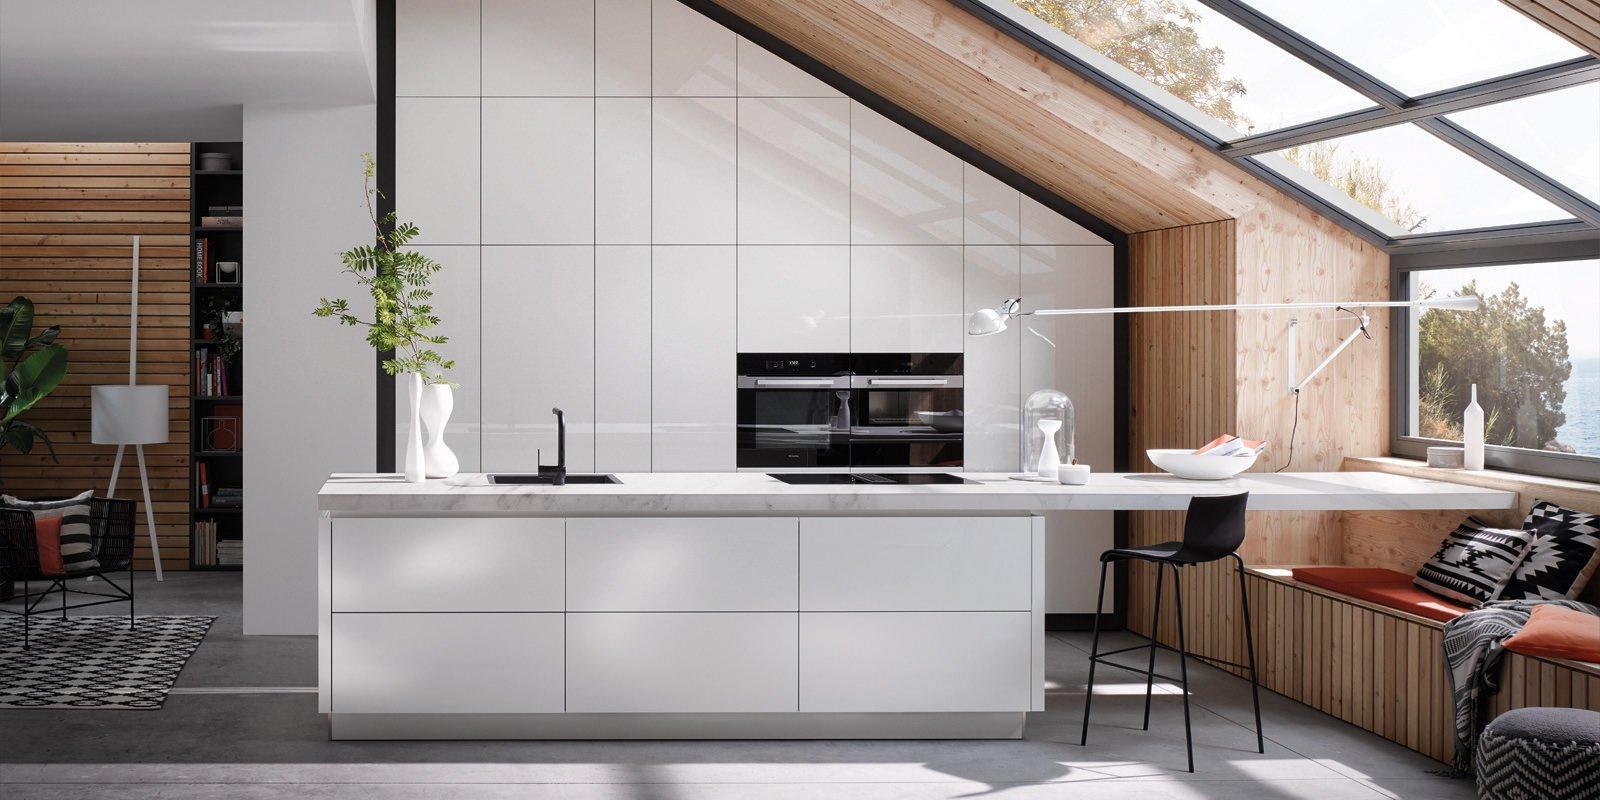 haecker kitchens oneline